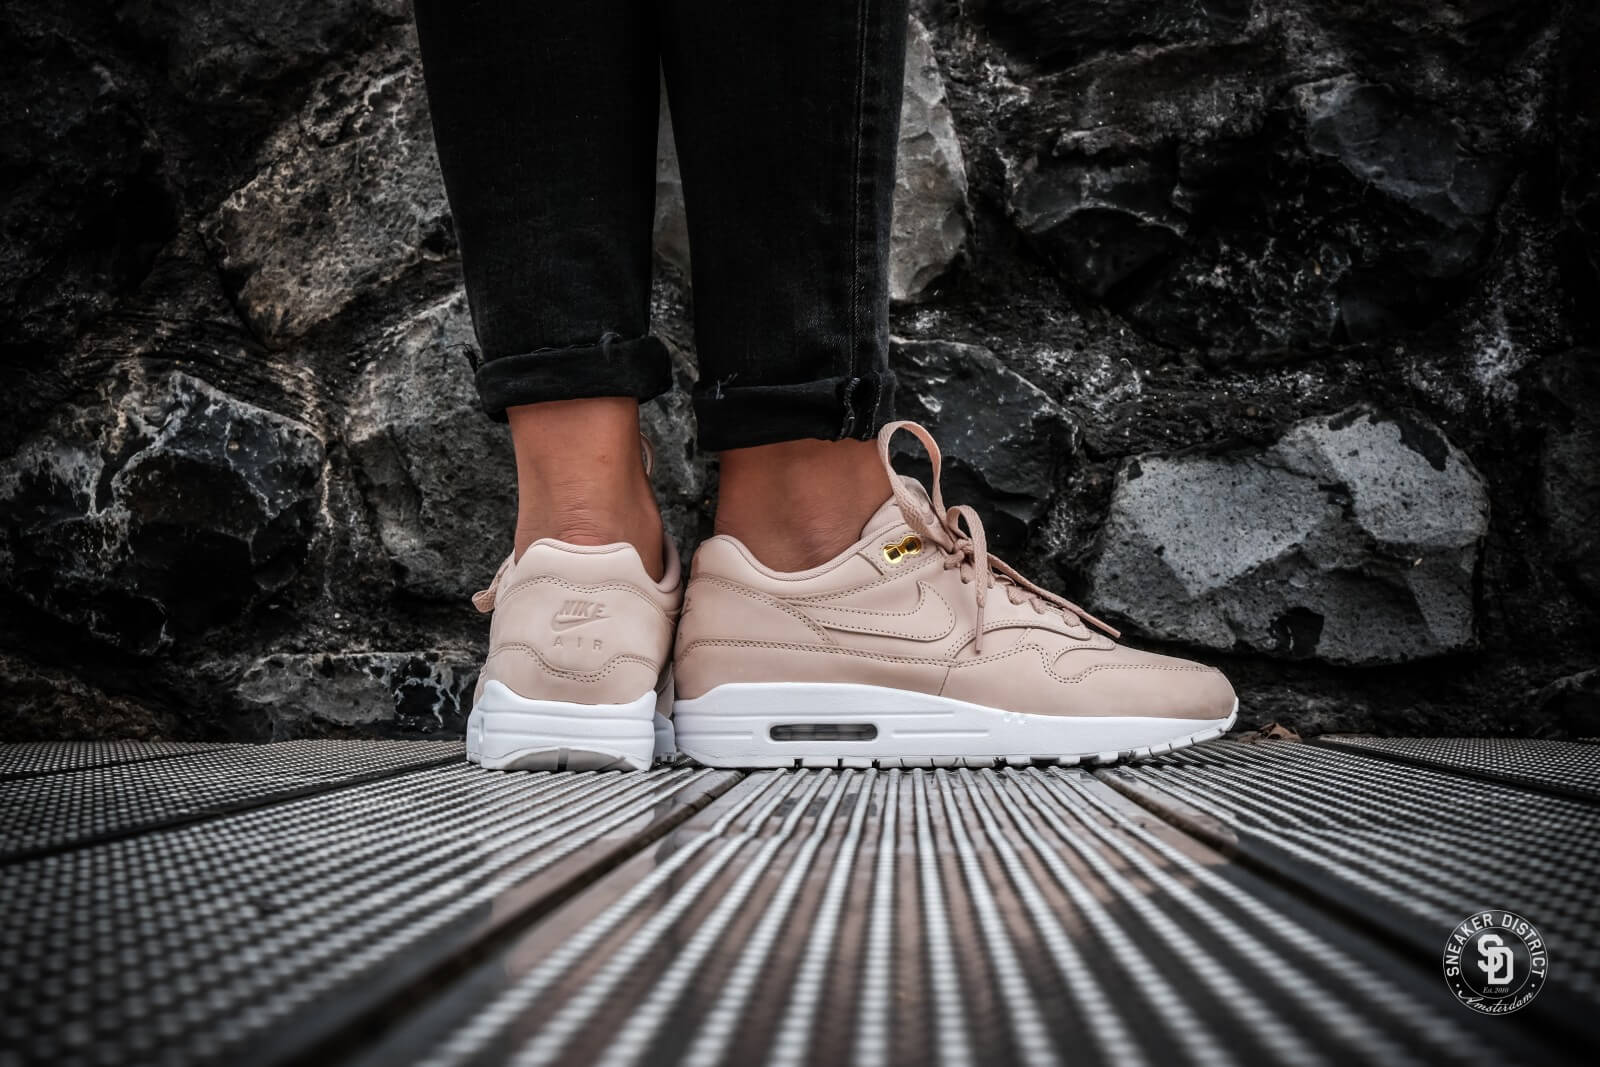 Nike WMNS Air Max 1 Premium 'Bio Beige' Damen